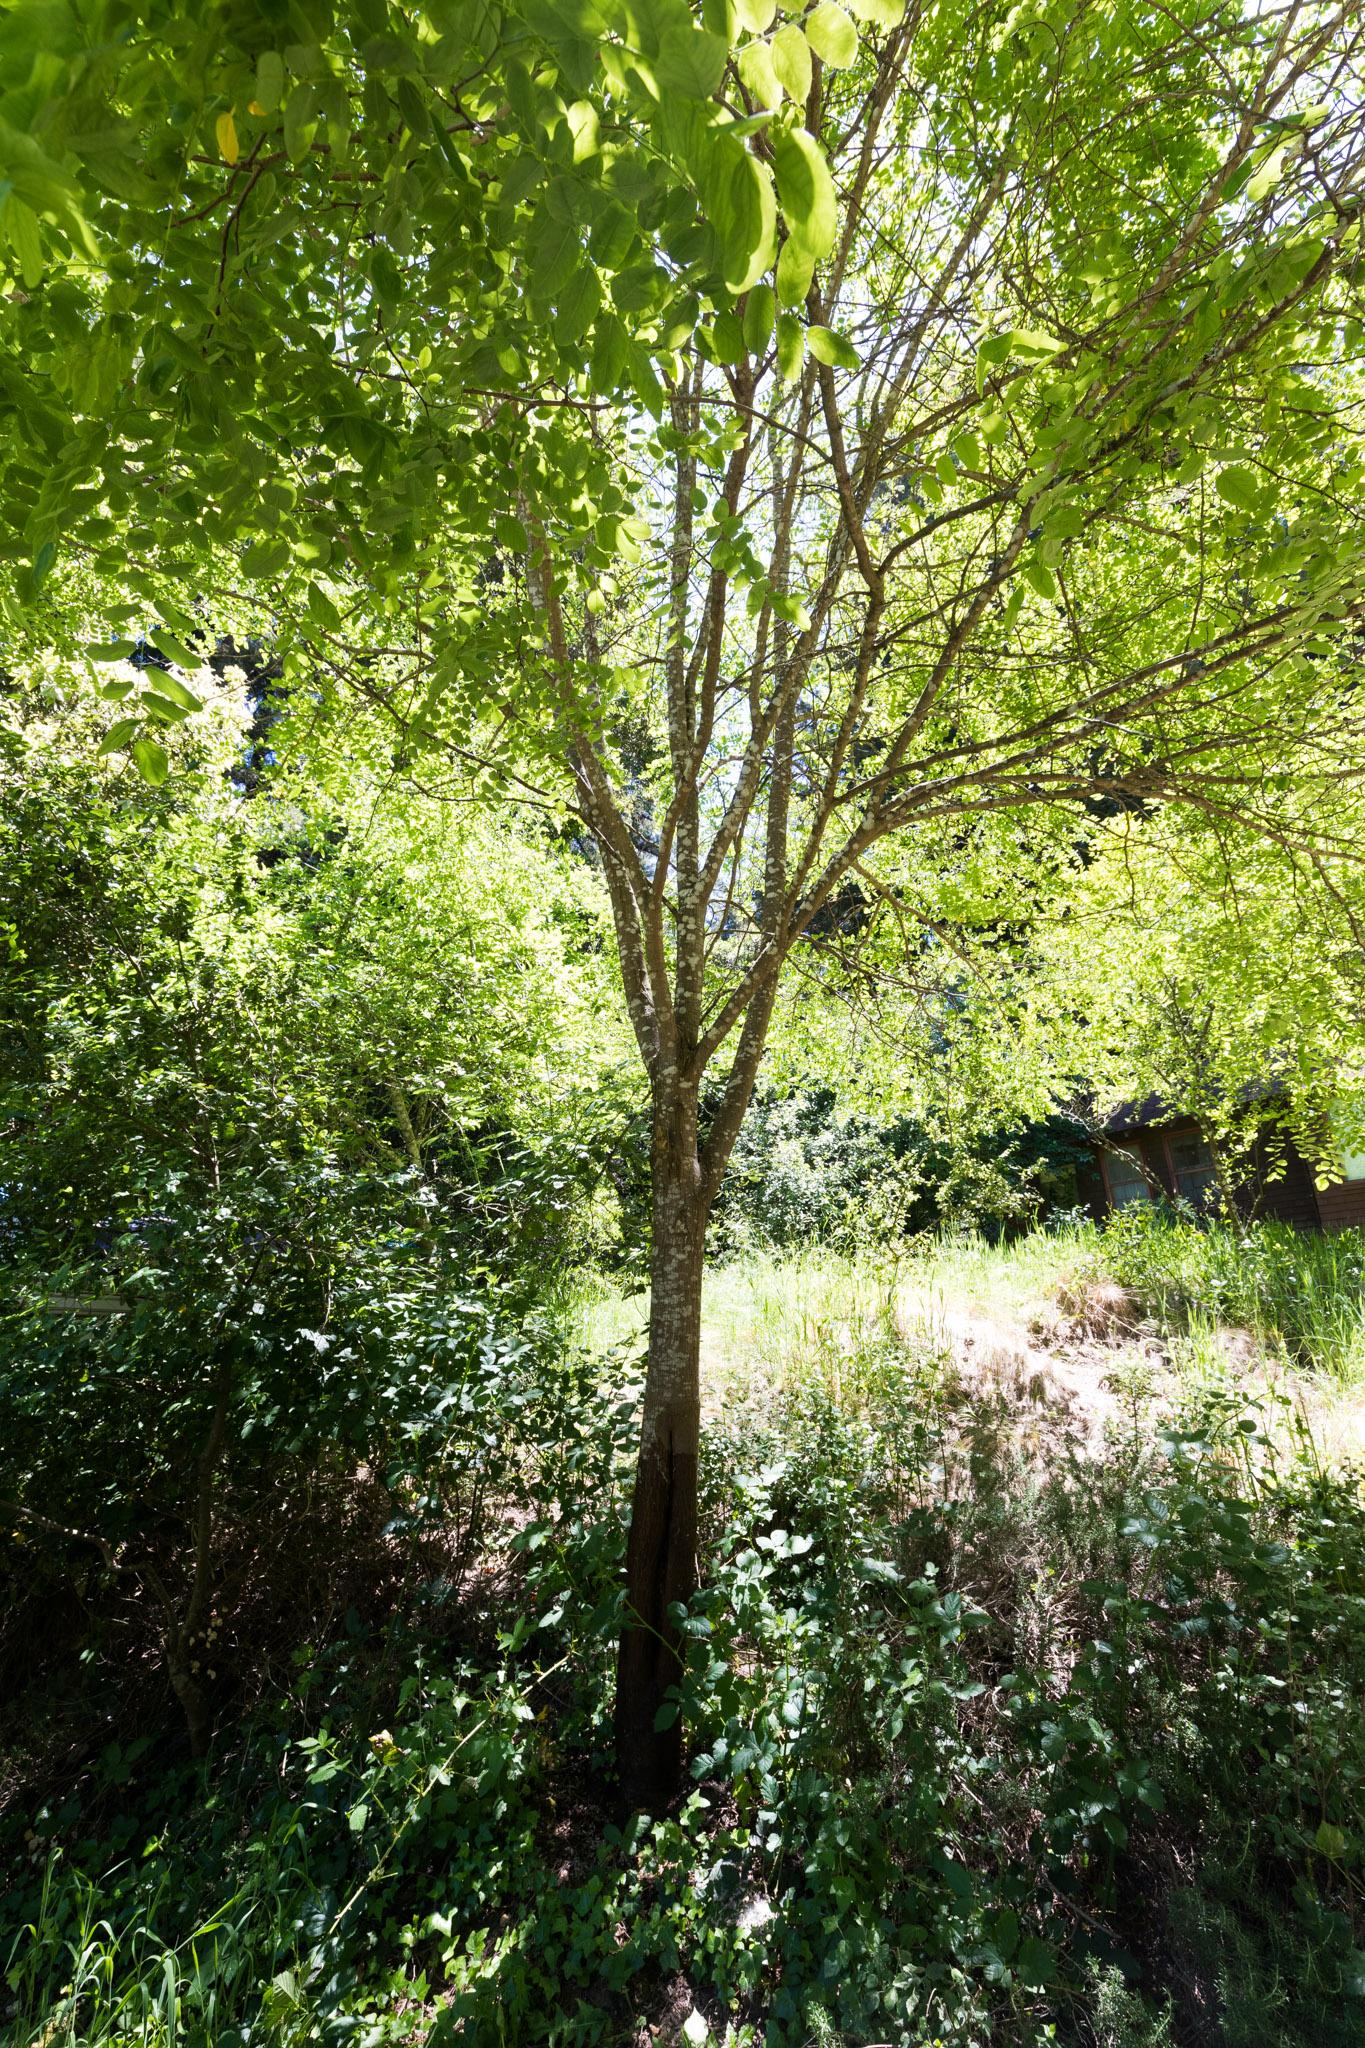 Founder's Tree